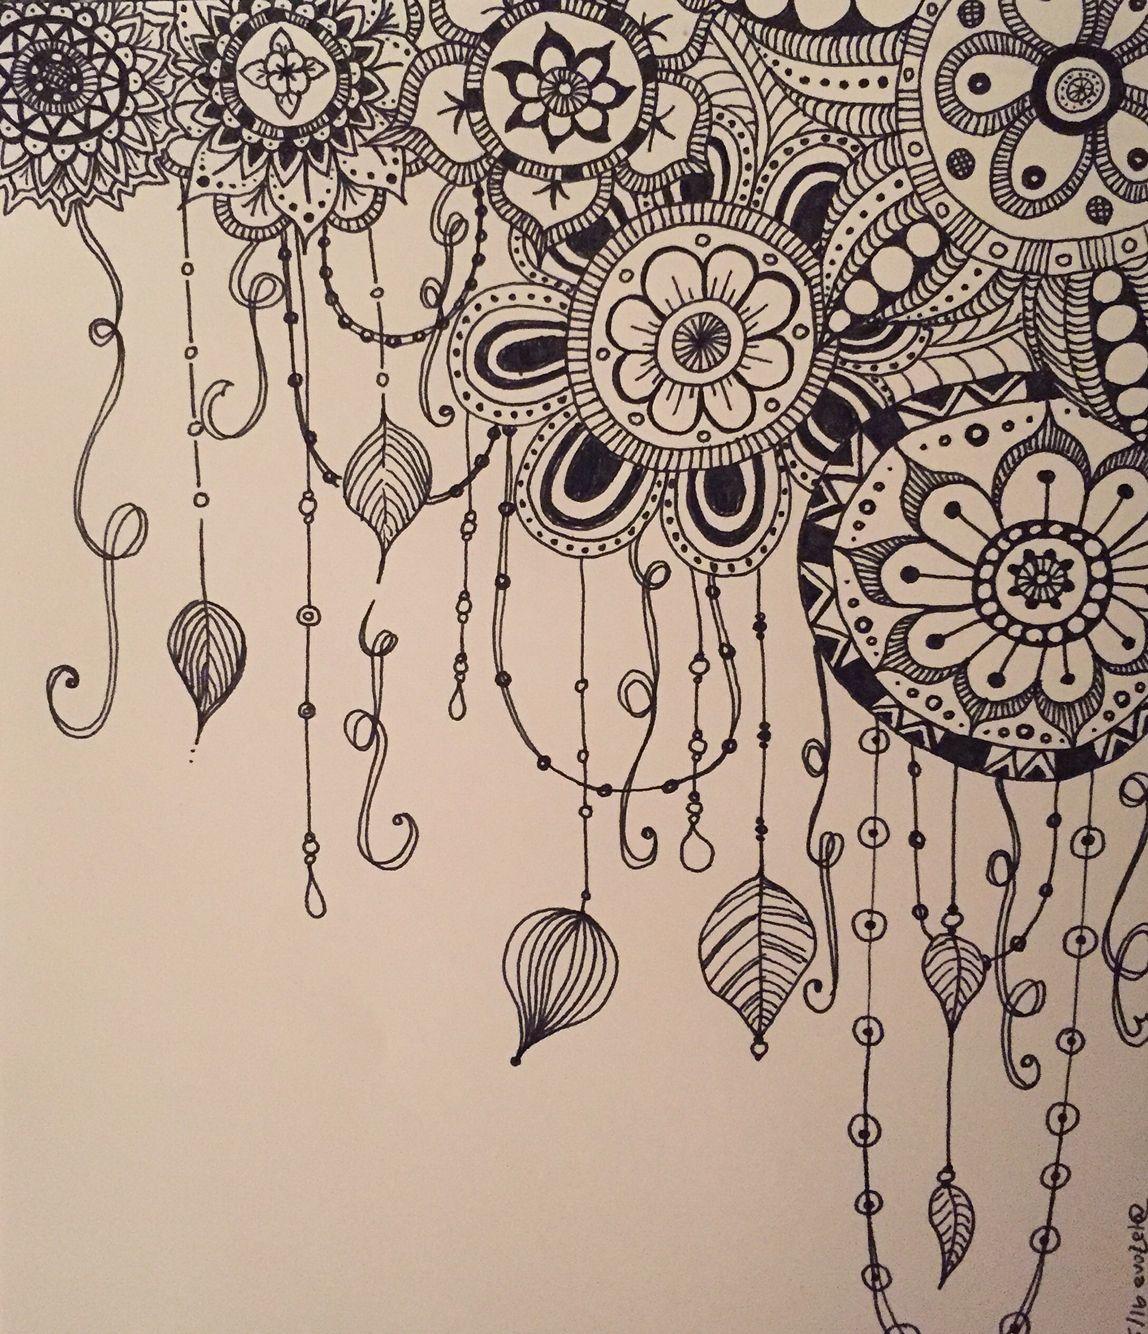 Bed Time Meditation Doodle Ornament Drawing Blackboard Art Zentangle Drawings